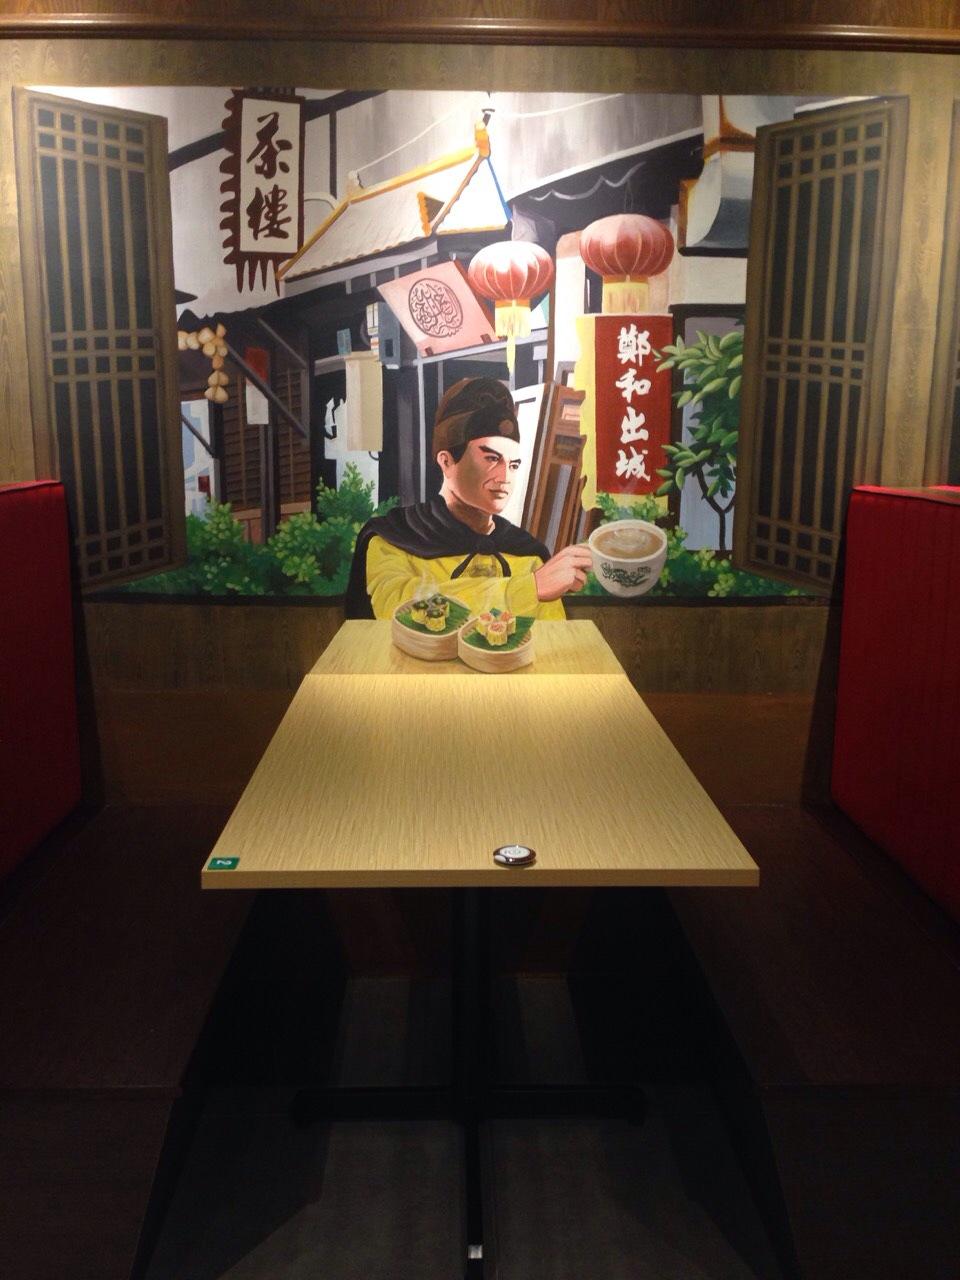 Art Misfits 3d mural for Mohd Chan's restaurant 2